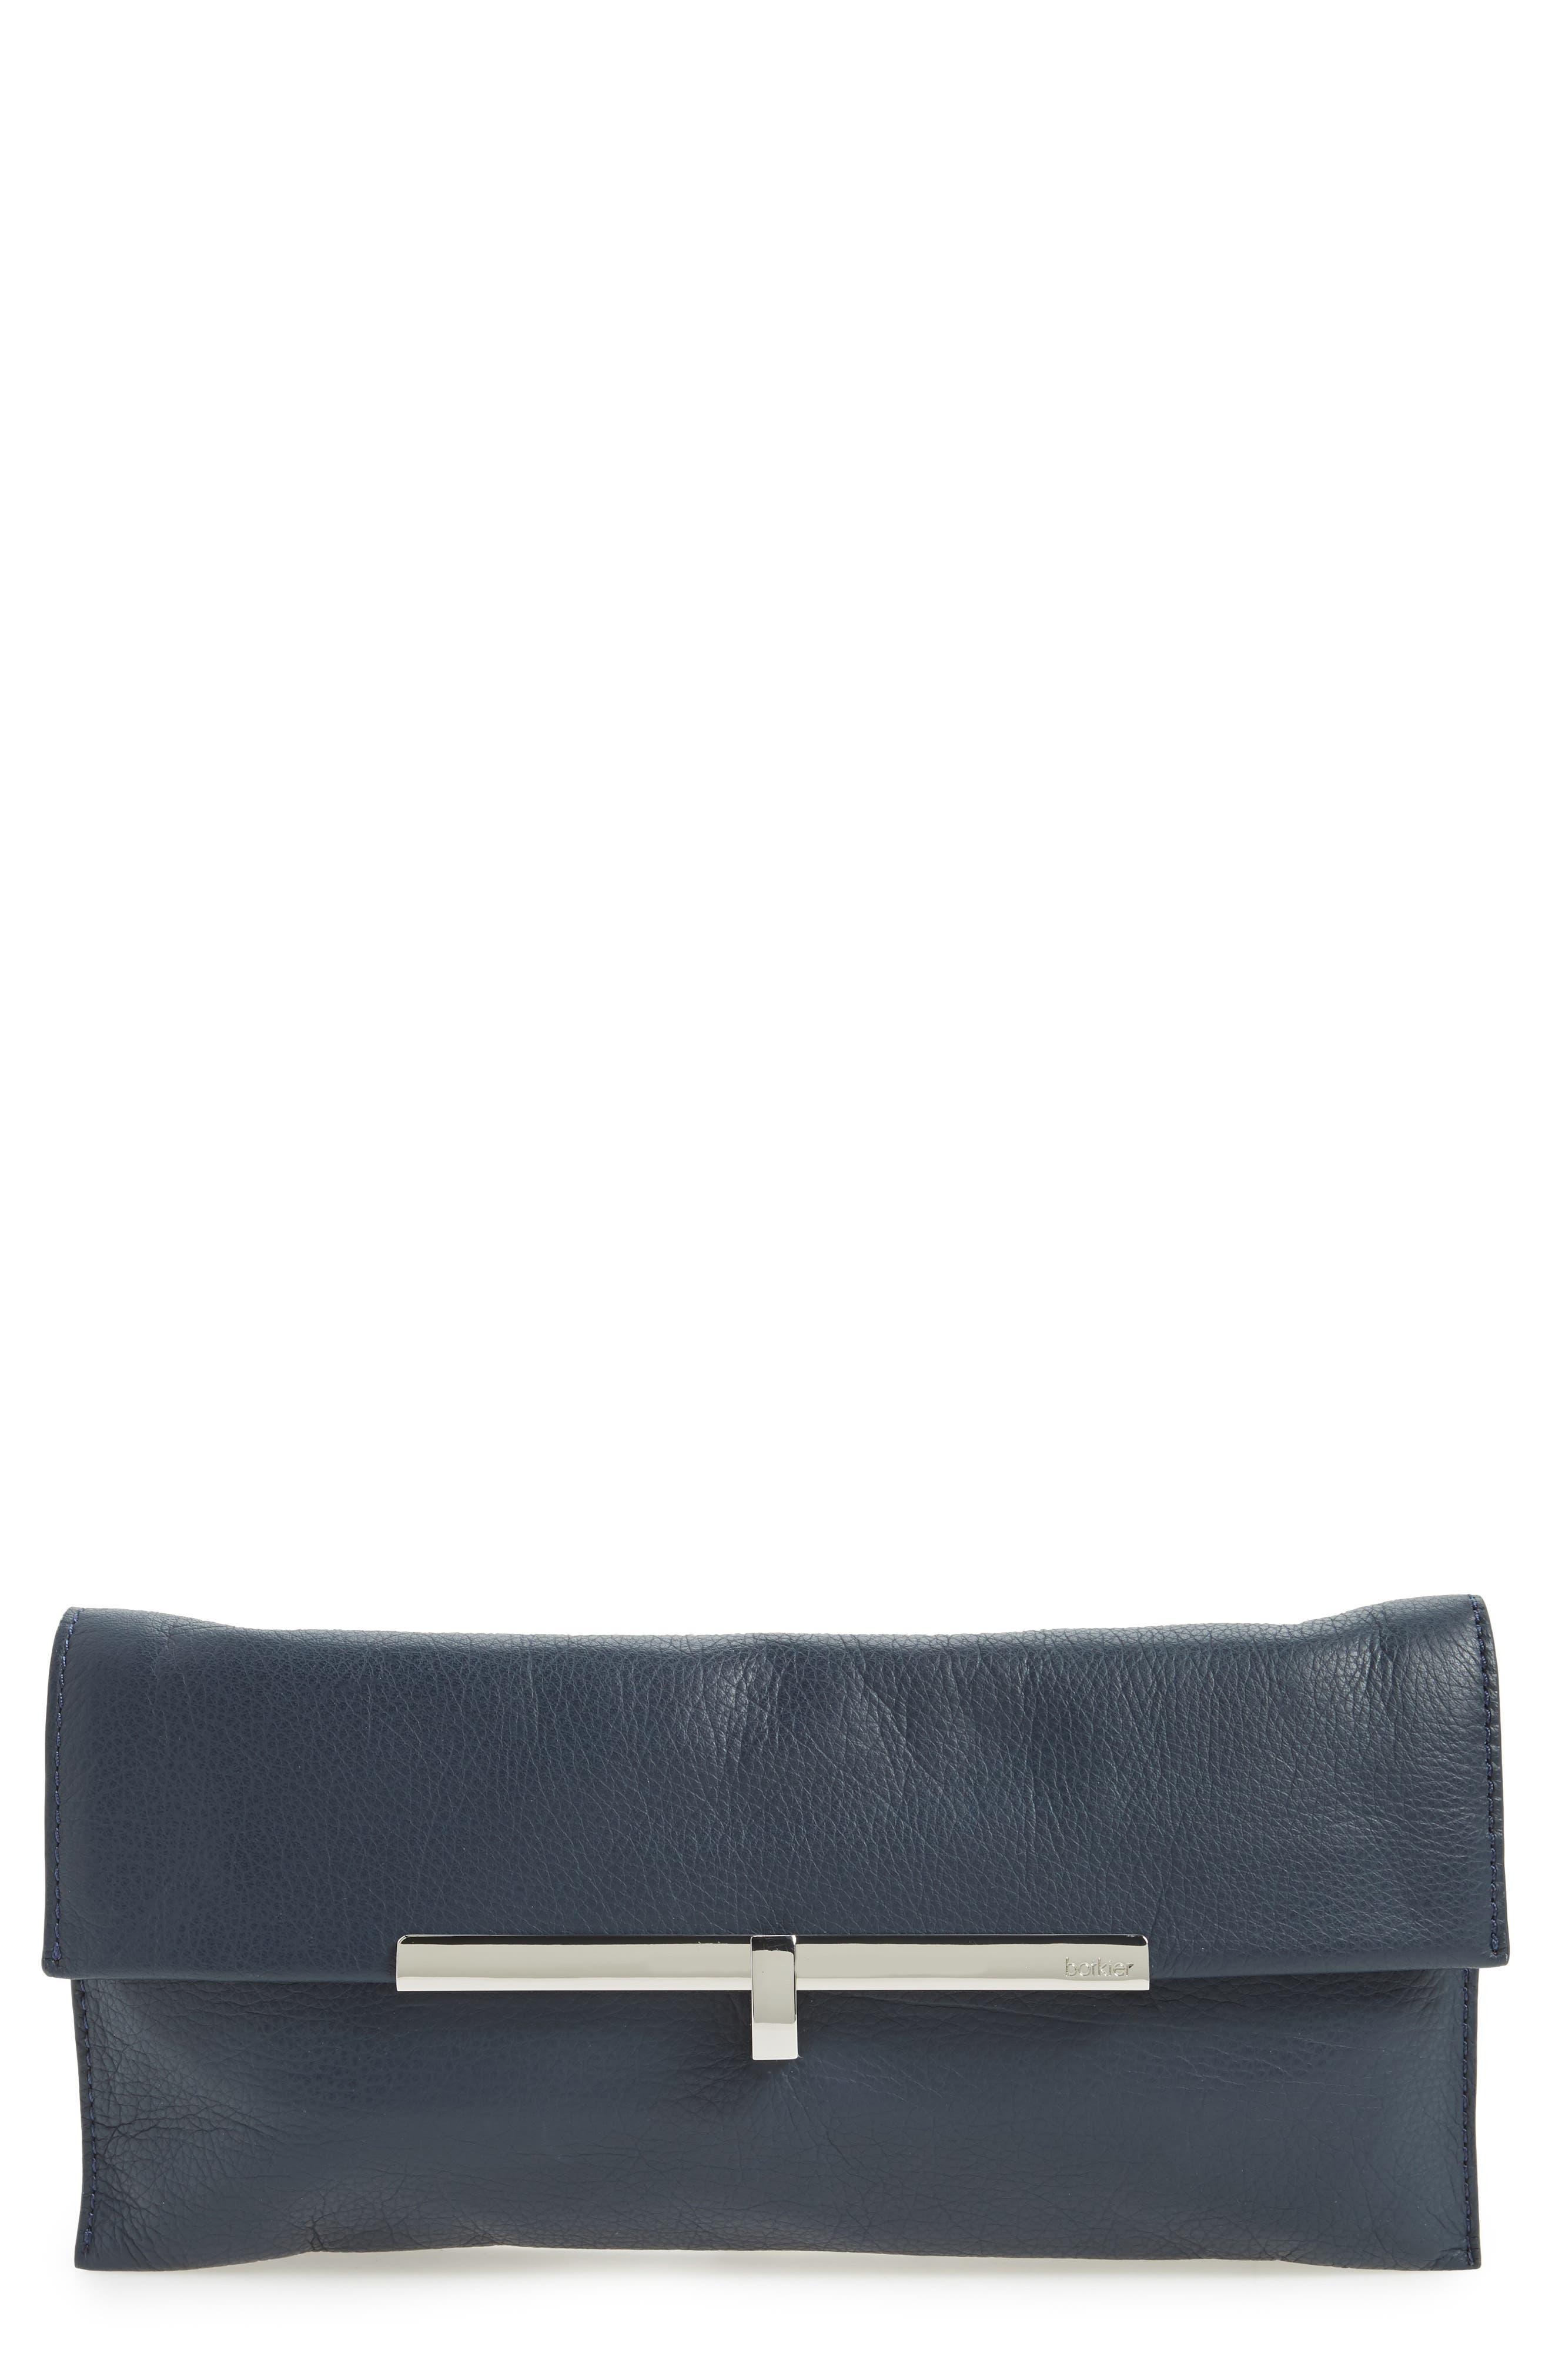 Main Image - Botkier Bleeker Leather Clutch